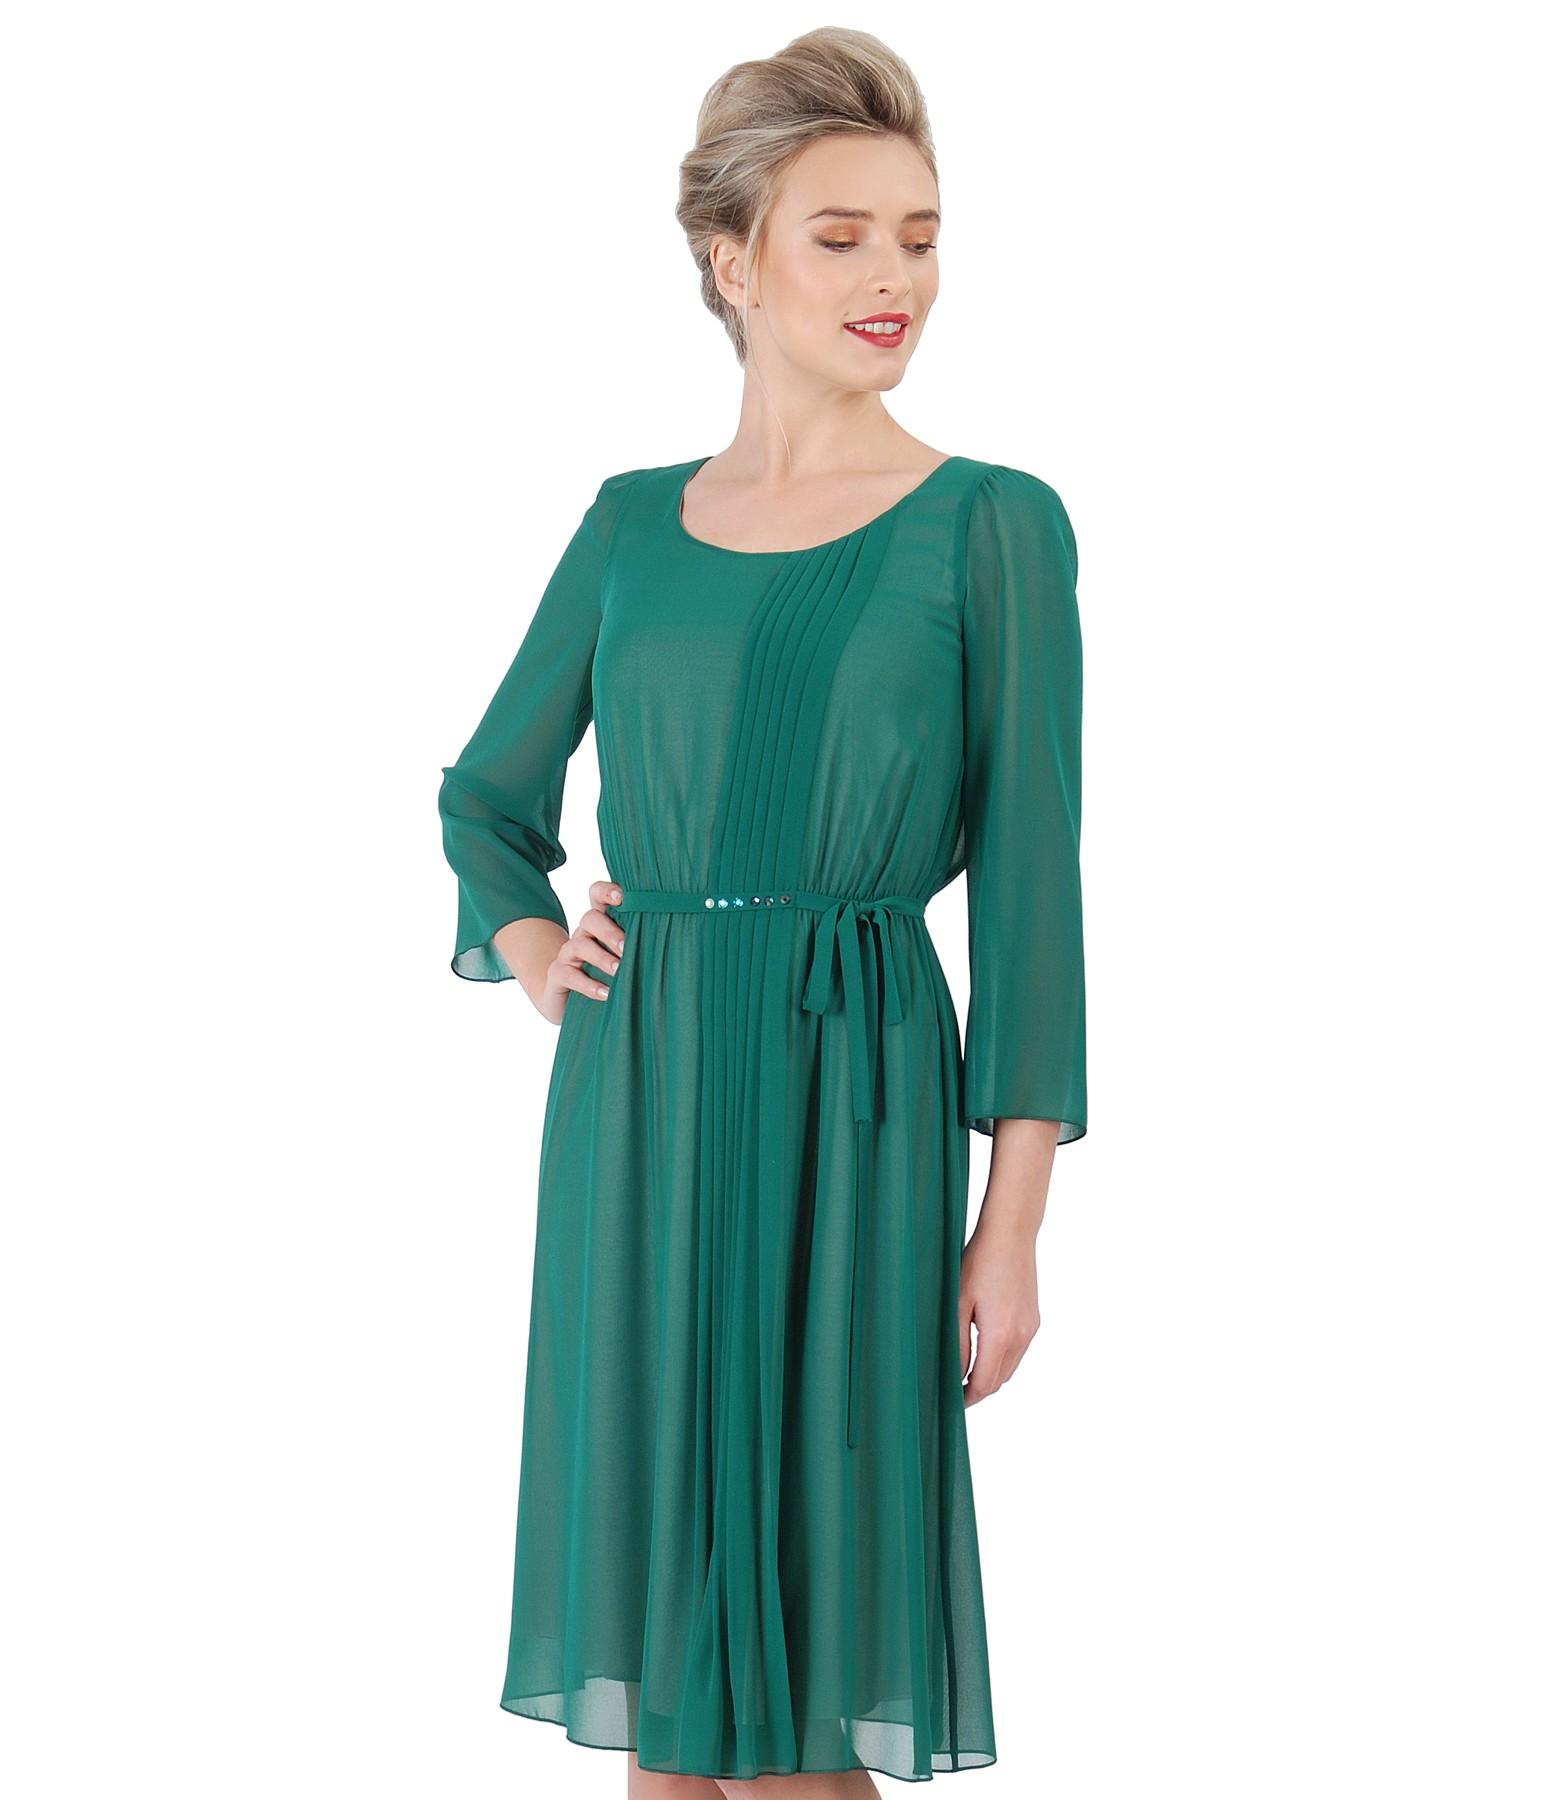 Veil evening dress with Swarovski crystals on the belt green - YOKKO